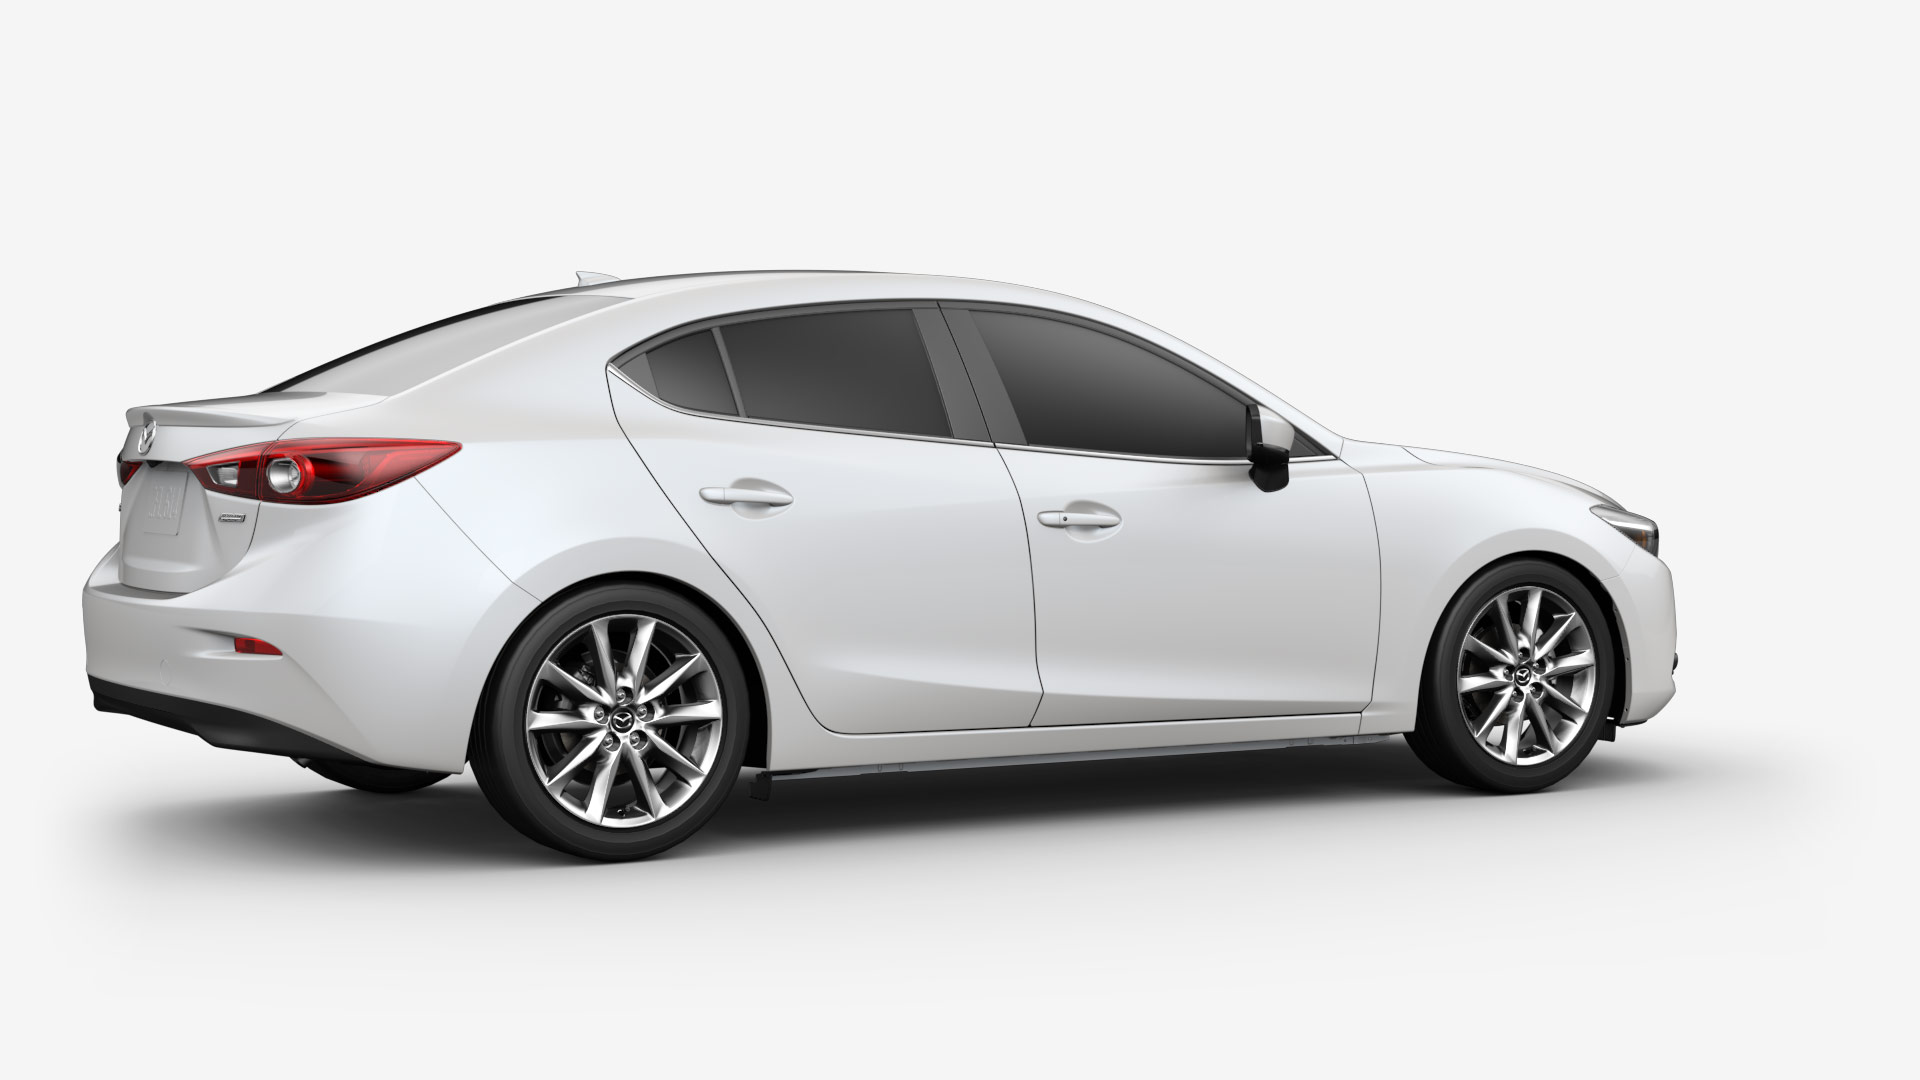 Mazda Sedan Fuel Efficient Compact Car Mazda Usa